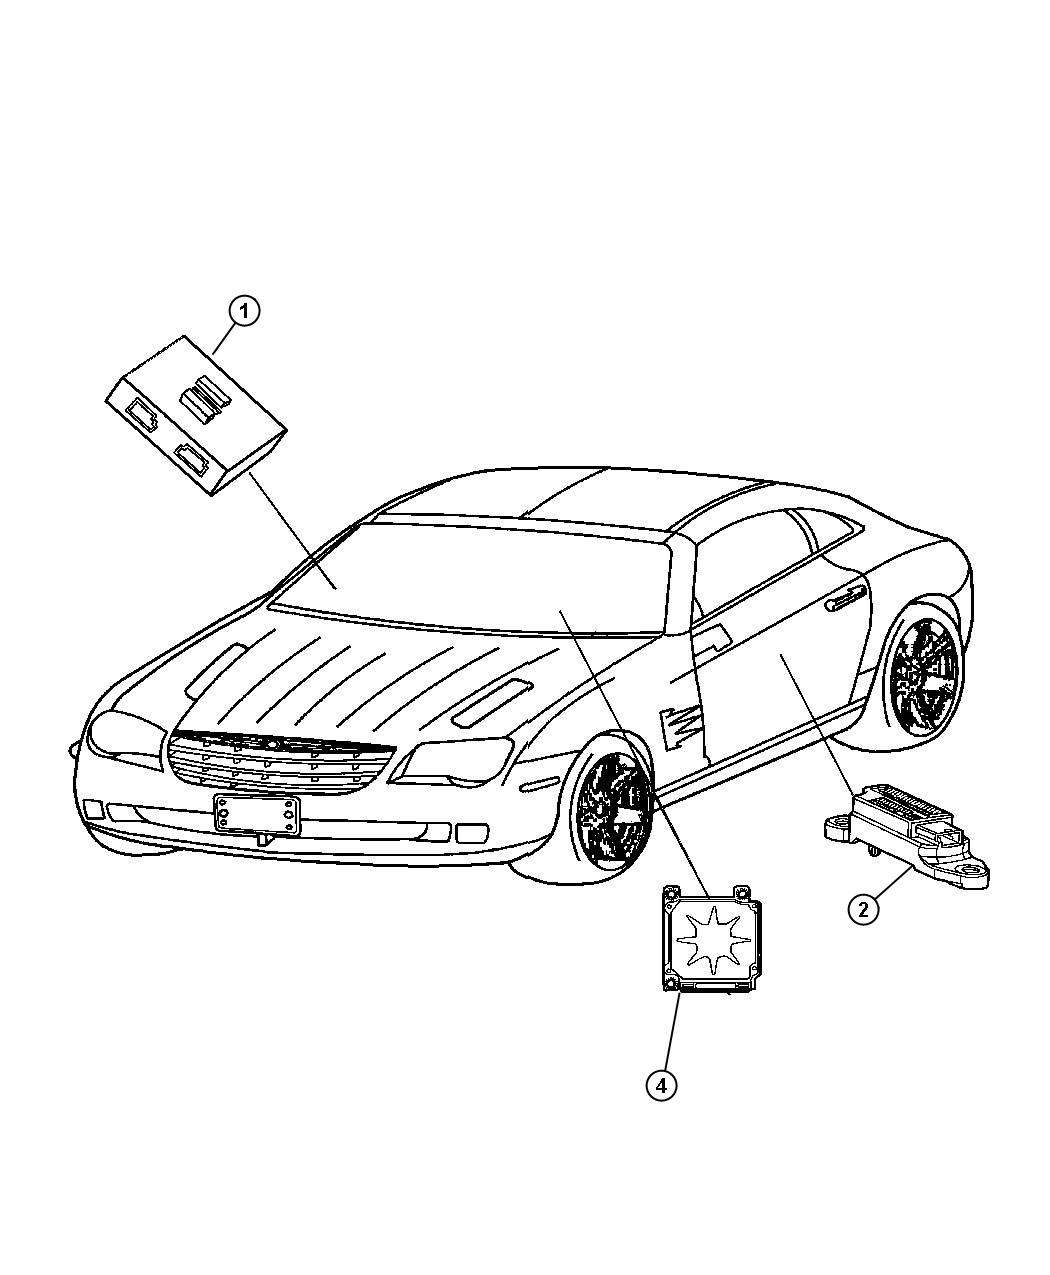 Chrysler Crossfire Sensor Air Bag Build To Export Mkt Specifications